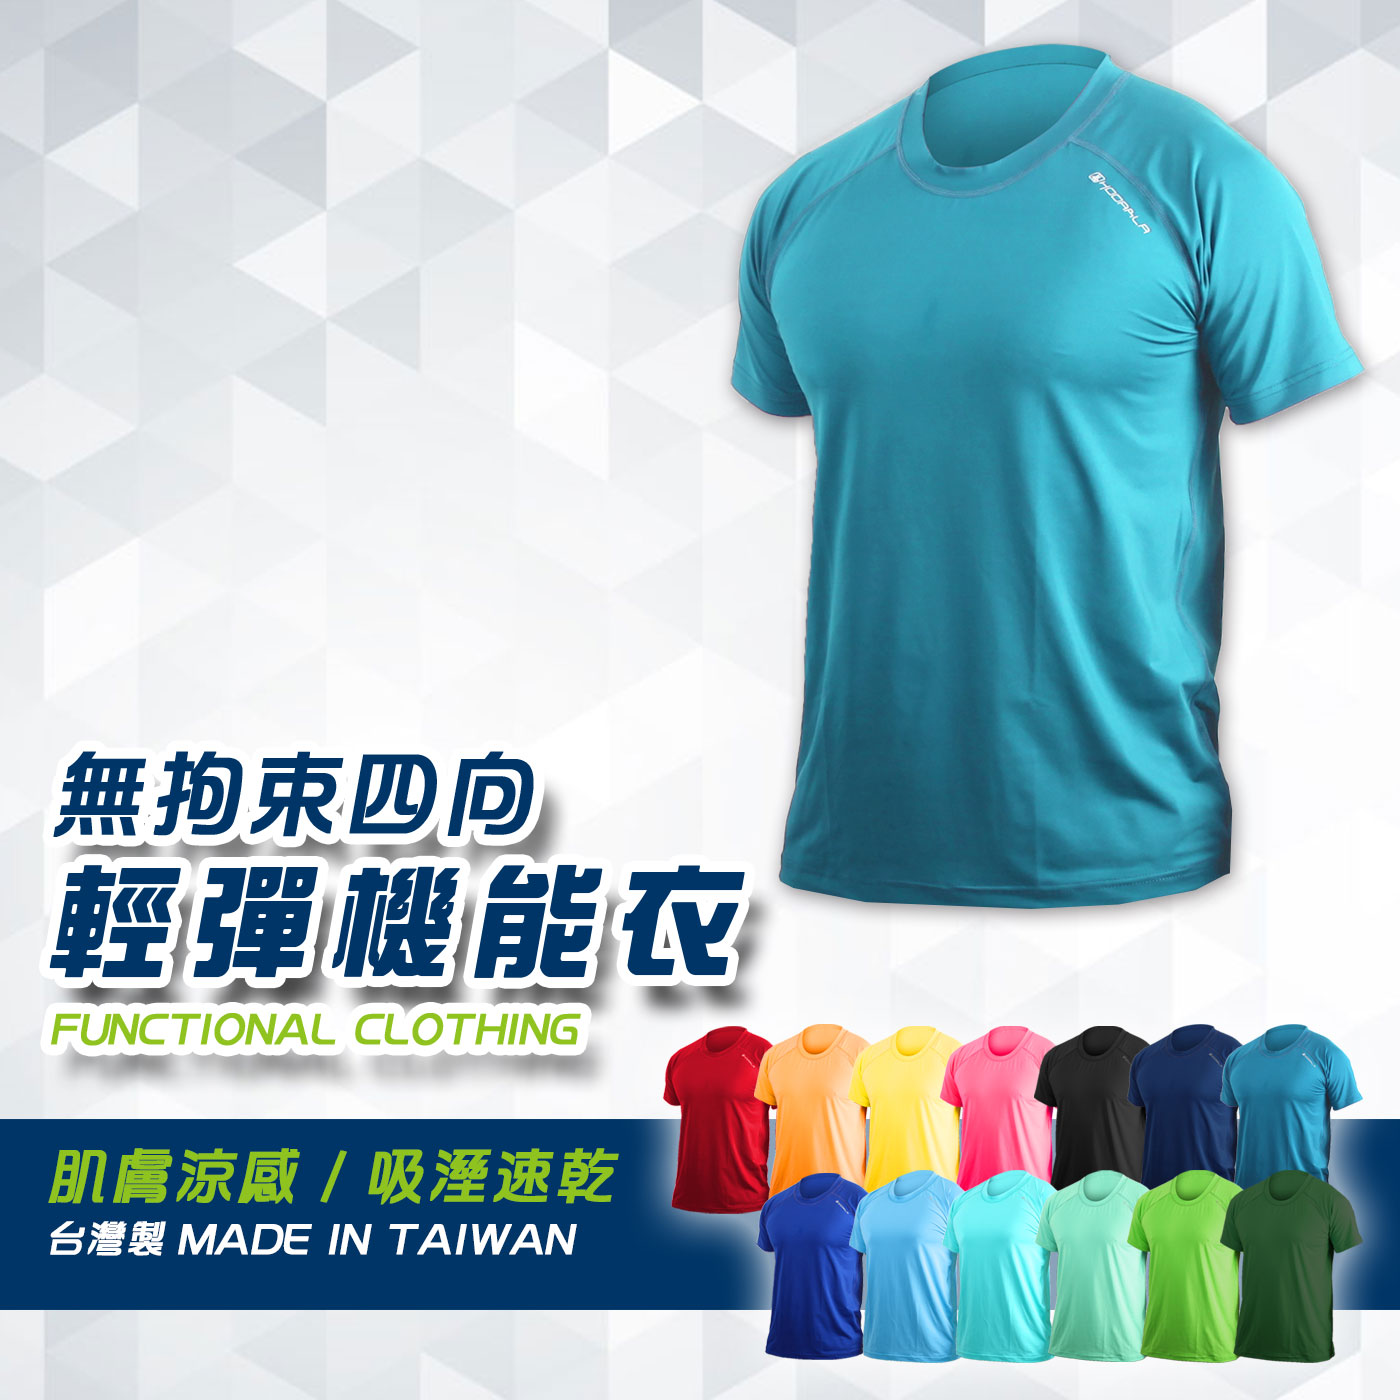 HODARLA 男女无拘束短袖T恤-轻弹 抗UV 圆领 台湾制 凉感 路跑 蓝绿@3114805@